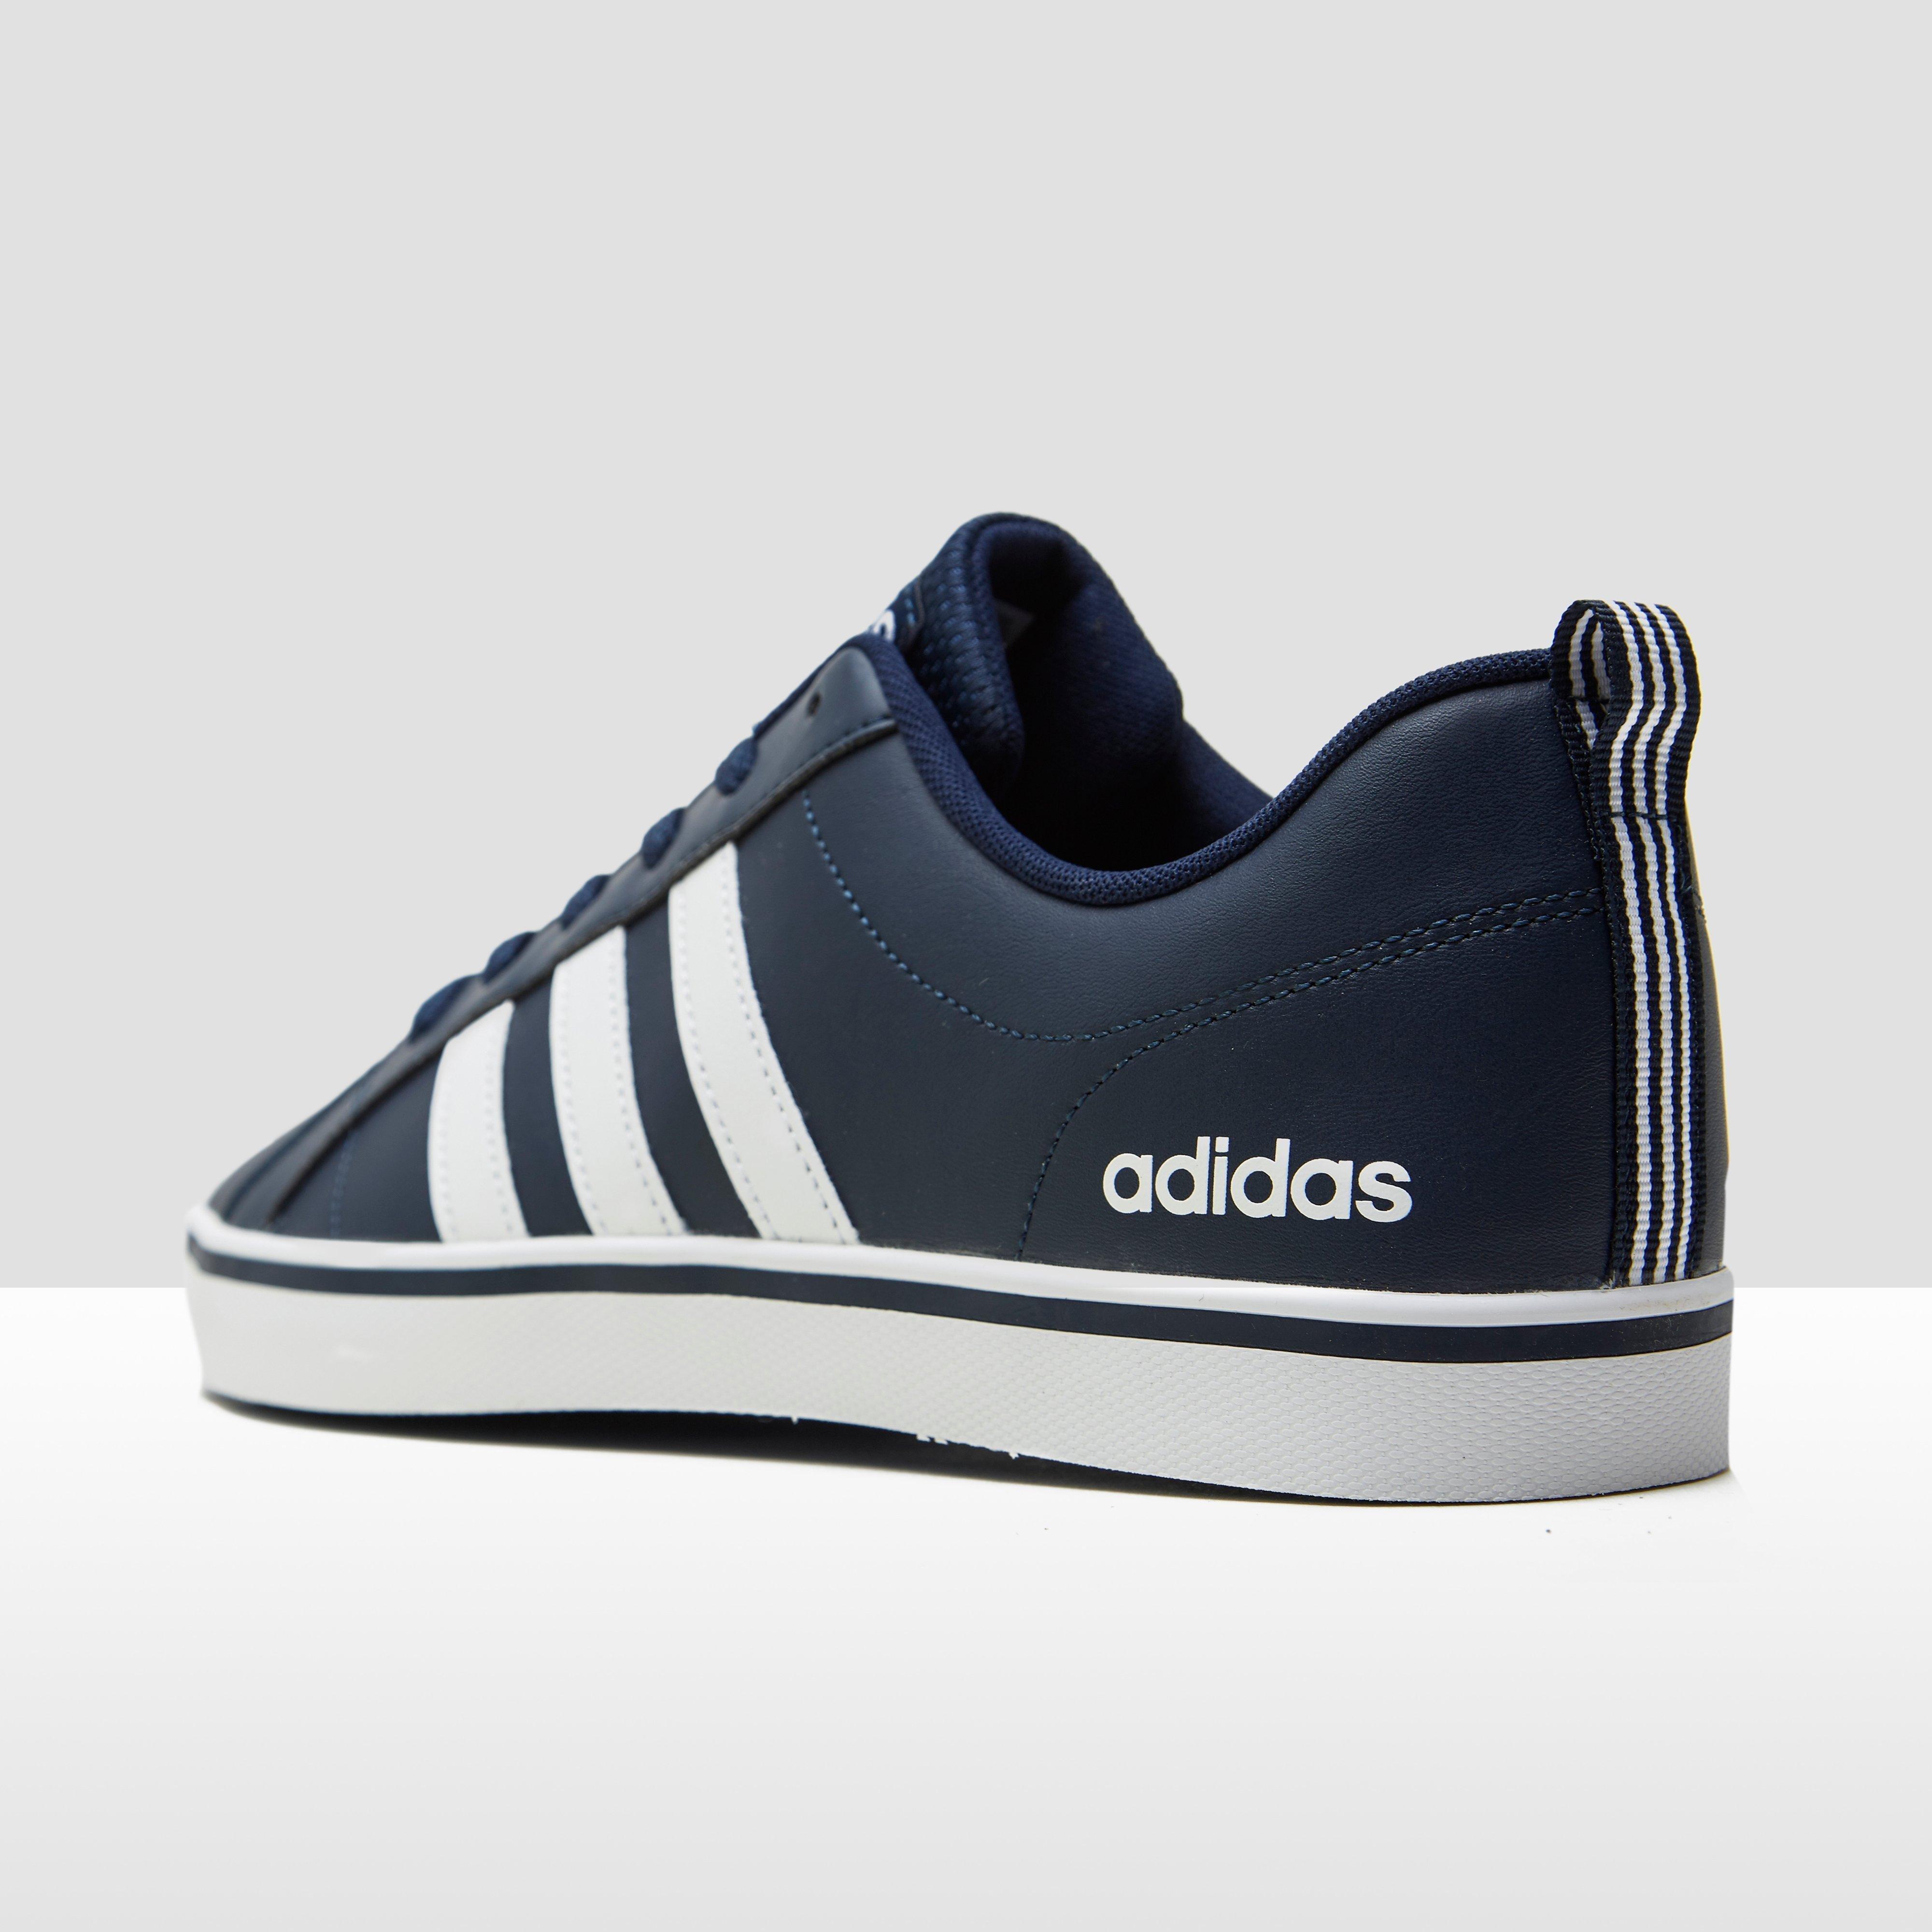 Adidas Men Vs Fitnessschuhe Avantage, Bleu, 11.5